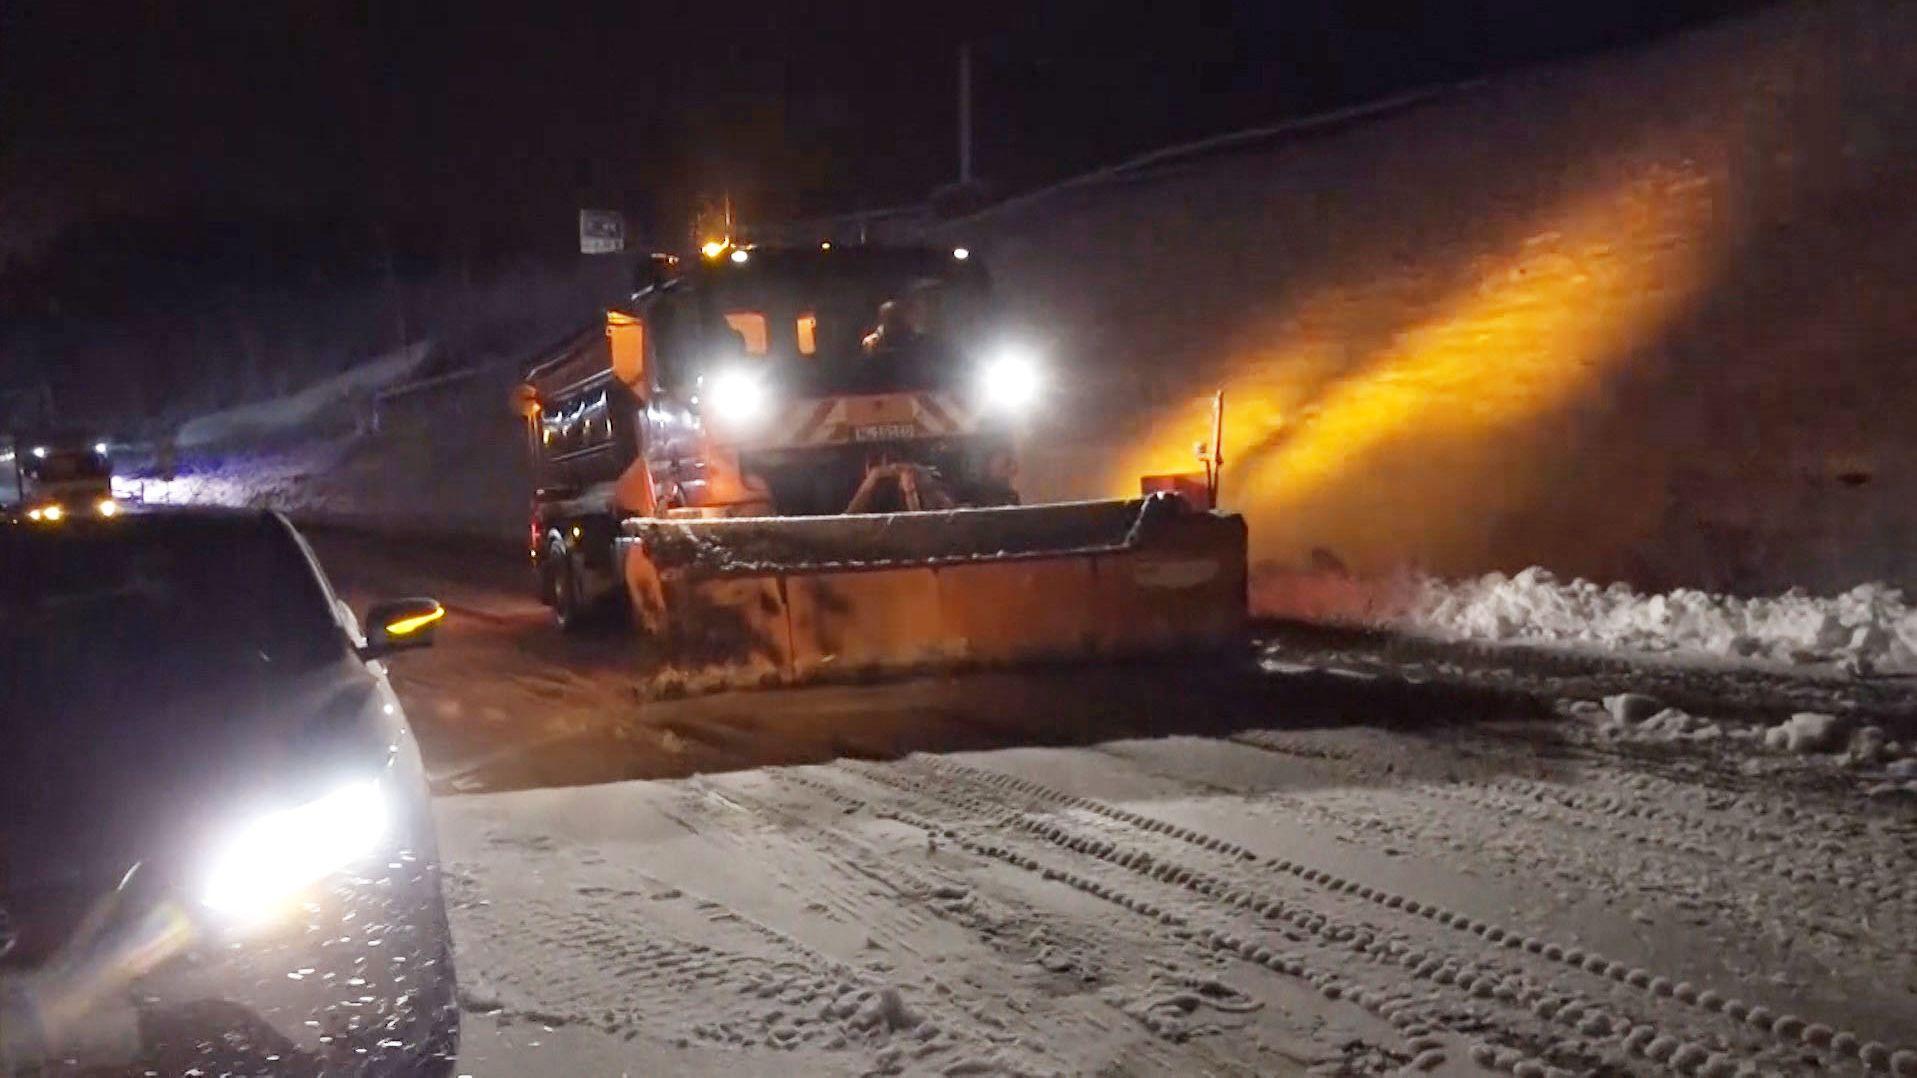 Schnee verursacht Verkehrsbehinderungen in Mainfranken